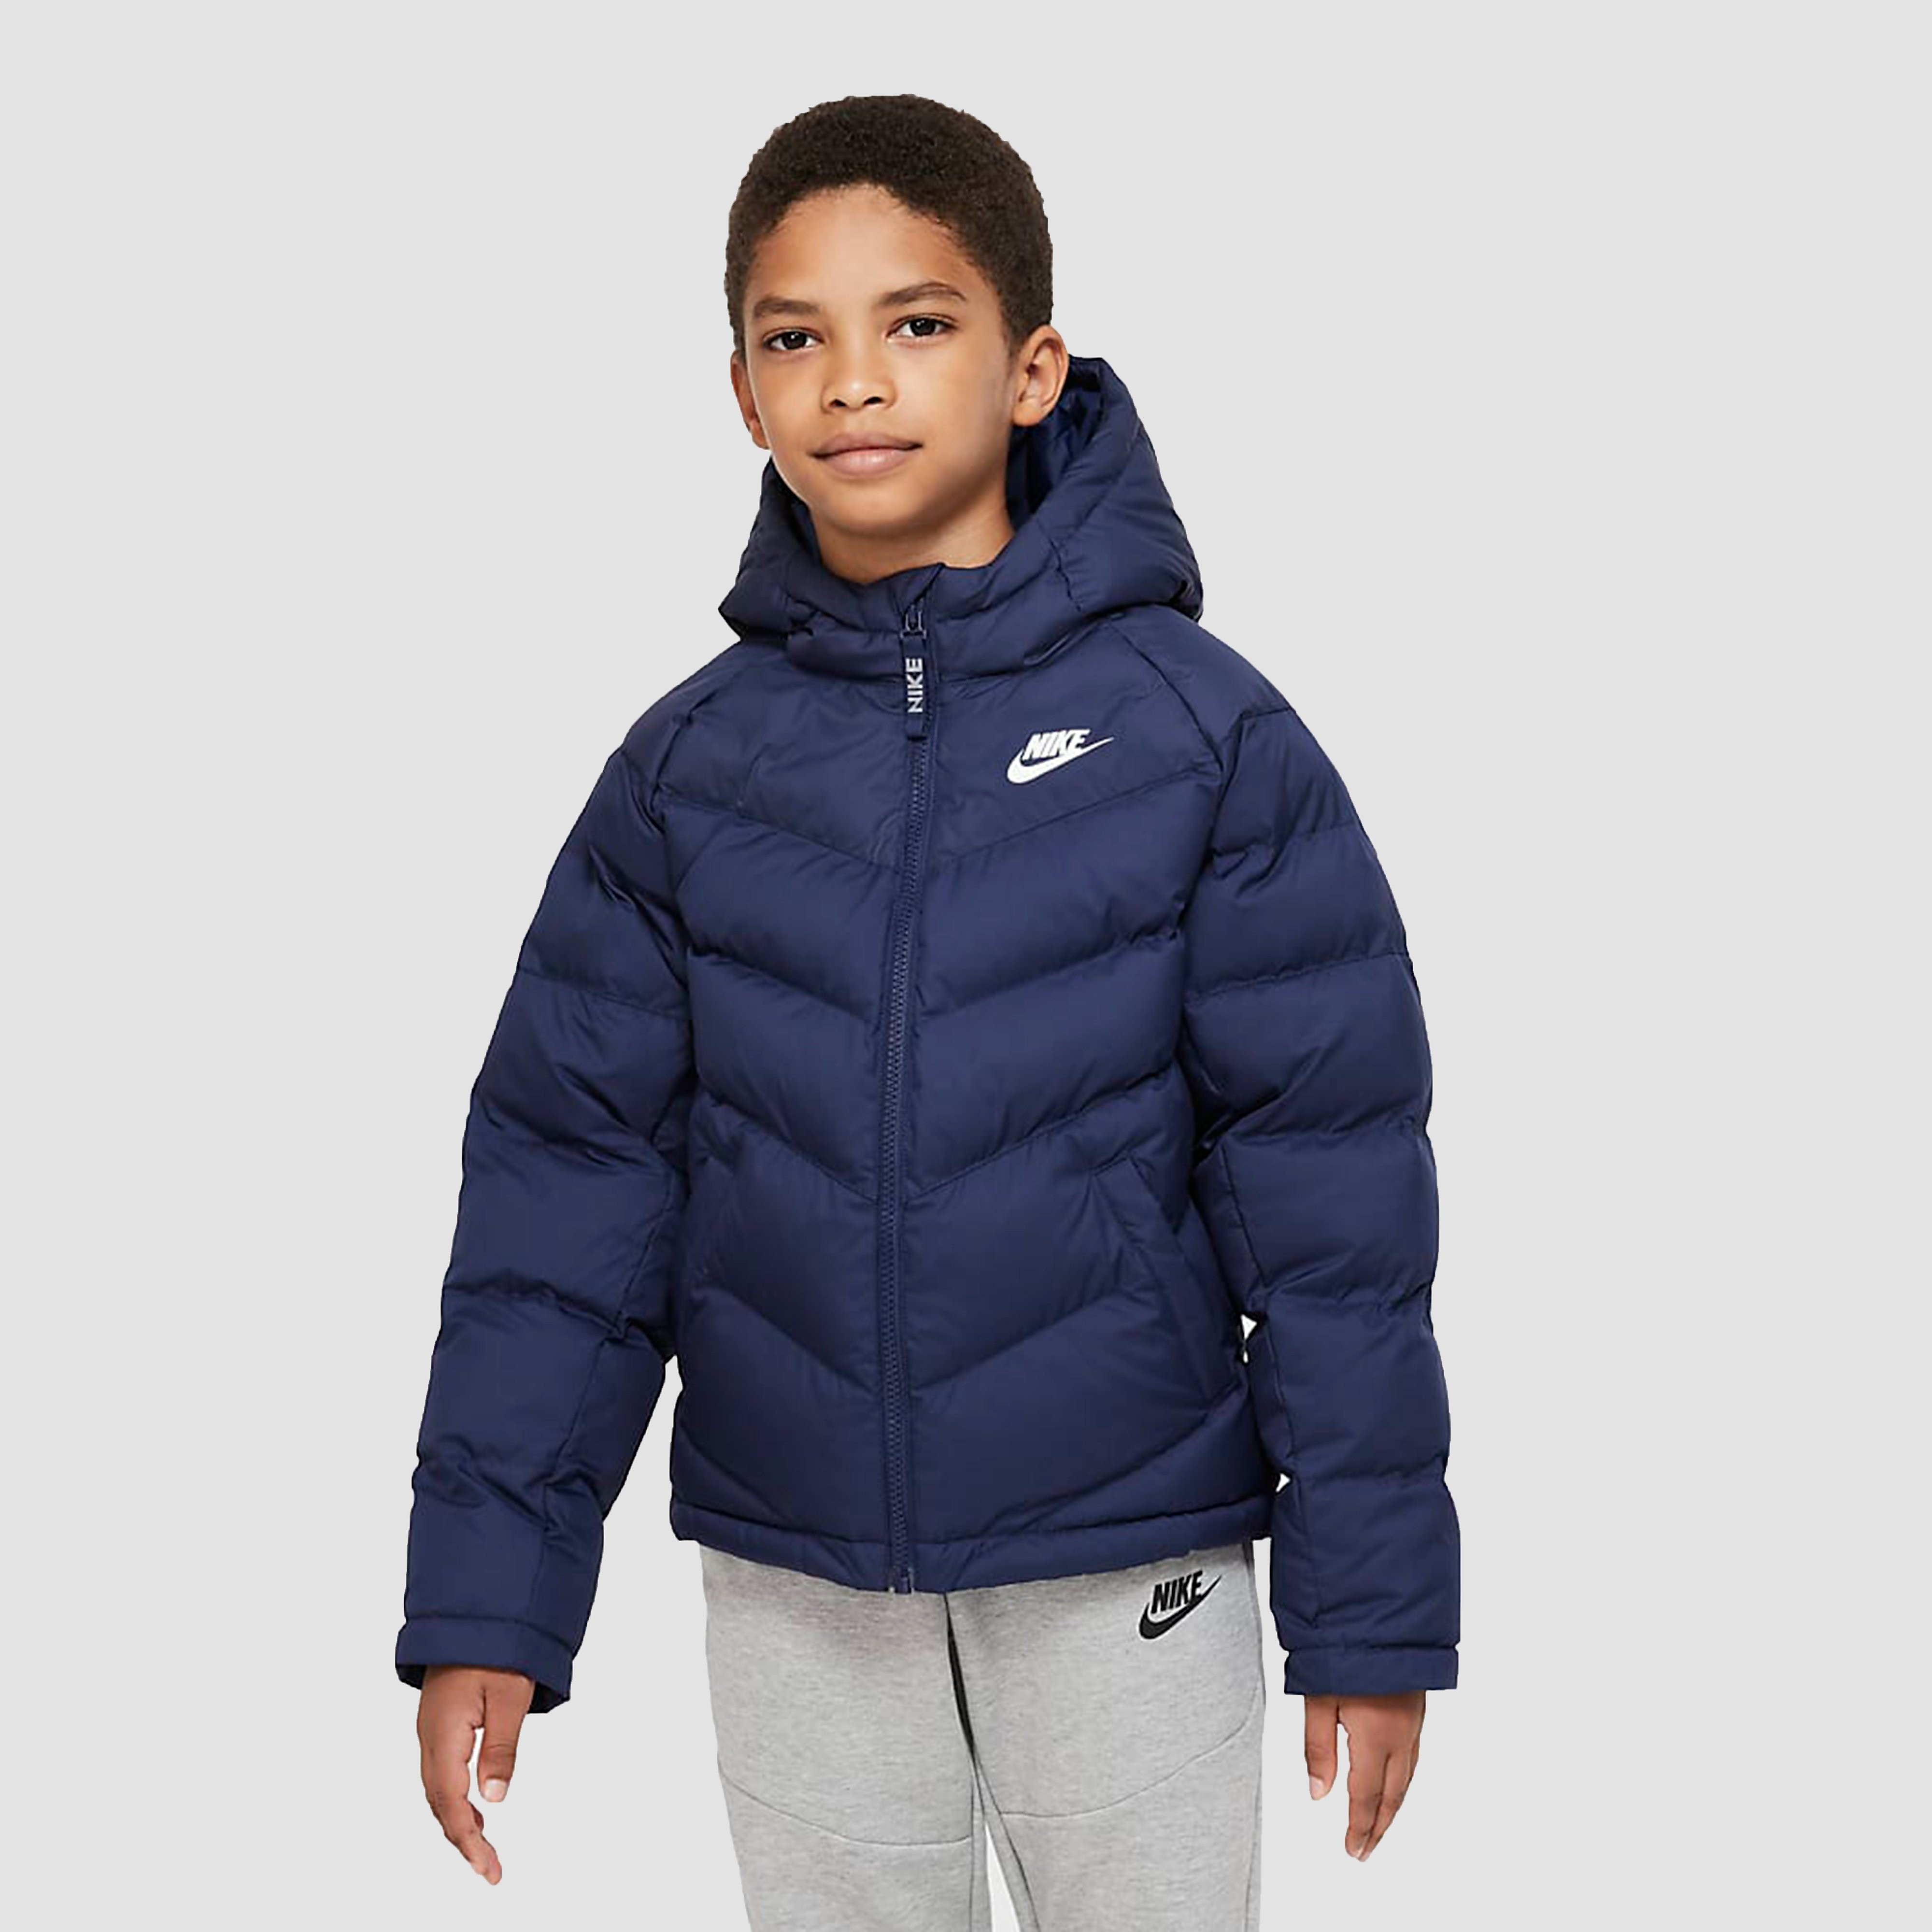 Nike Sportswear Gewatteerde Jas Junior Kind online kopen